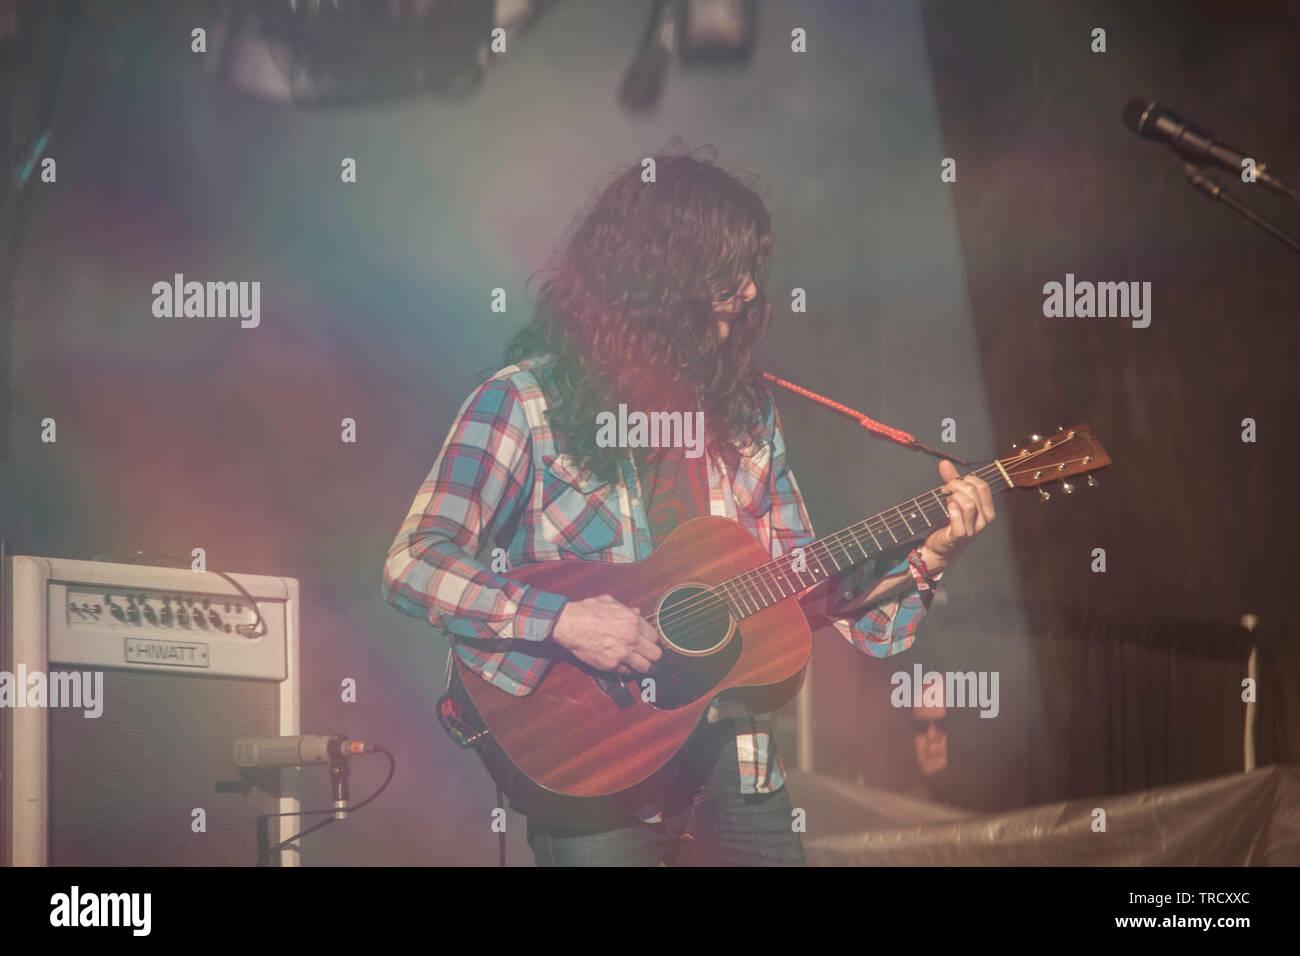 Kurt Vile at Primavera Sound 2019 - Stock Image